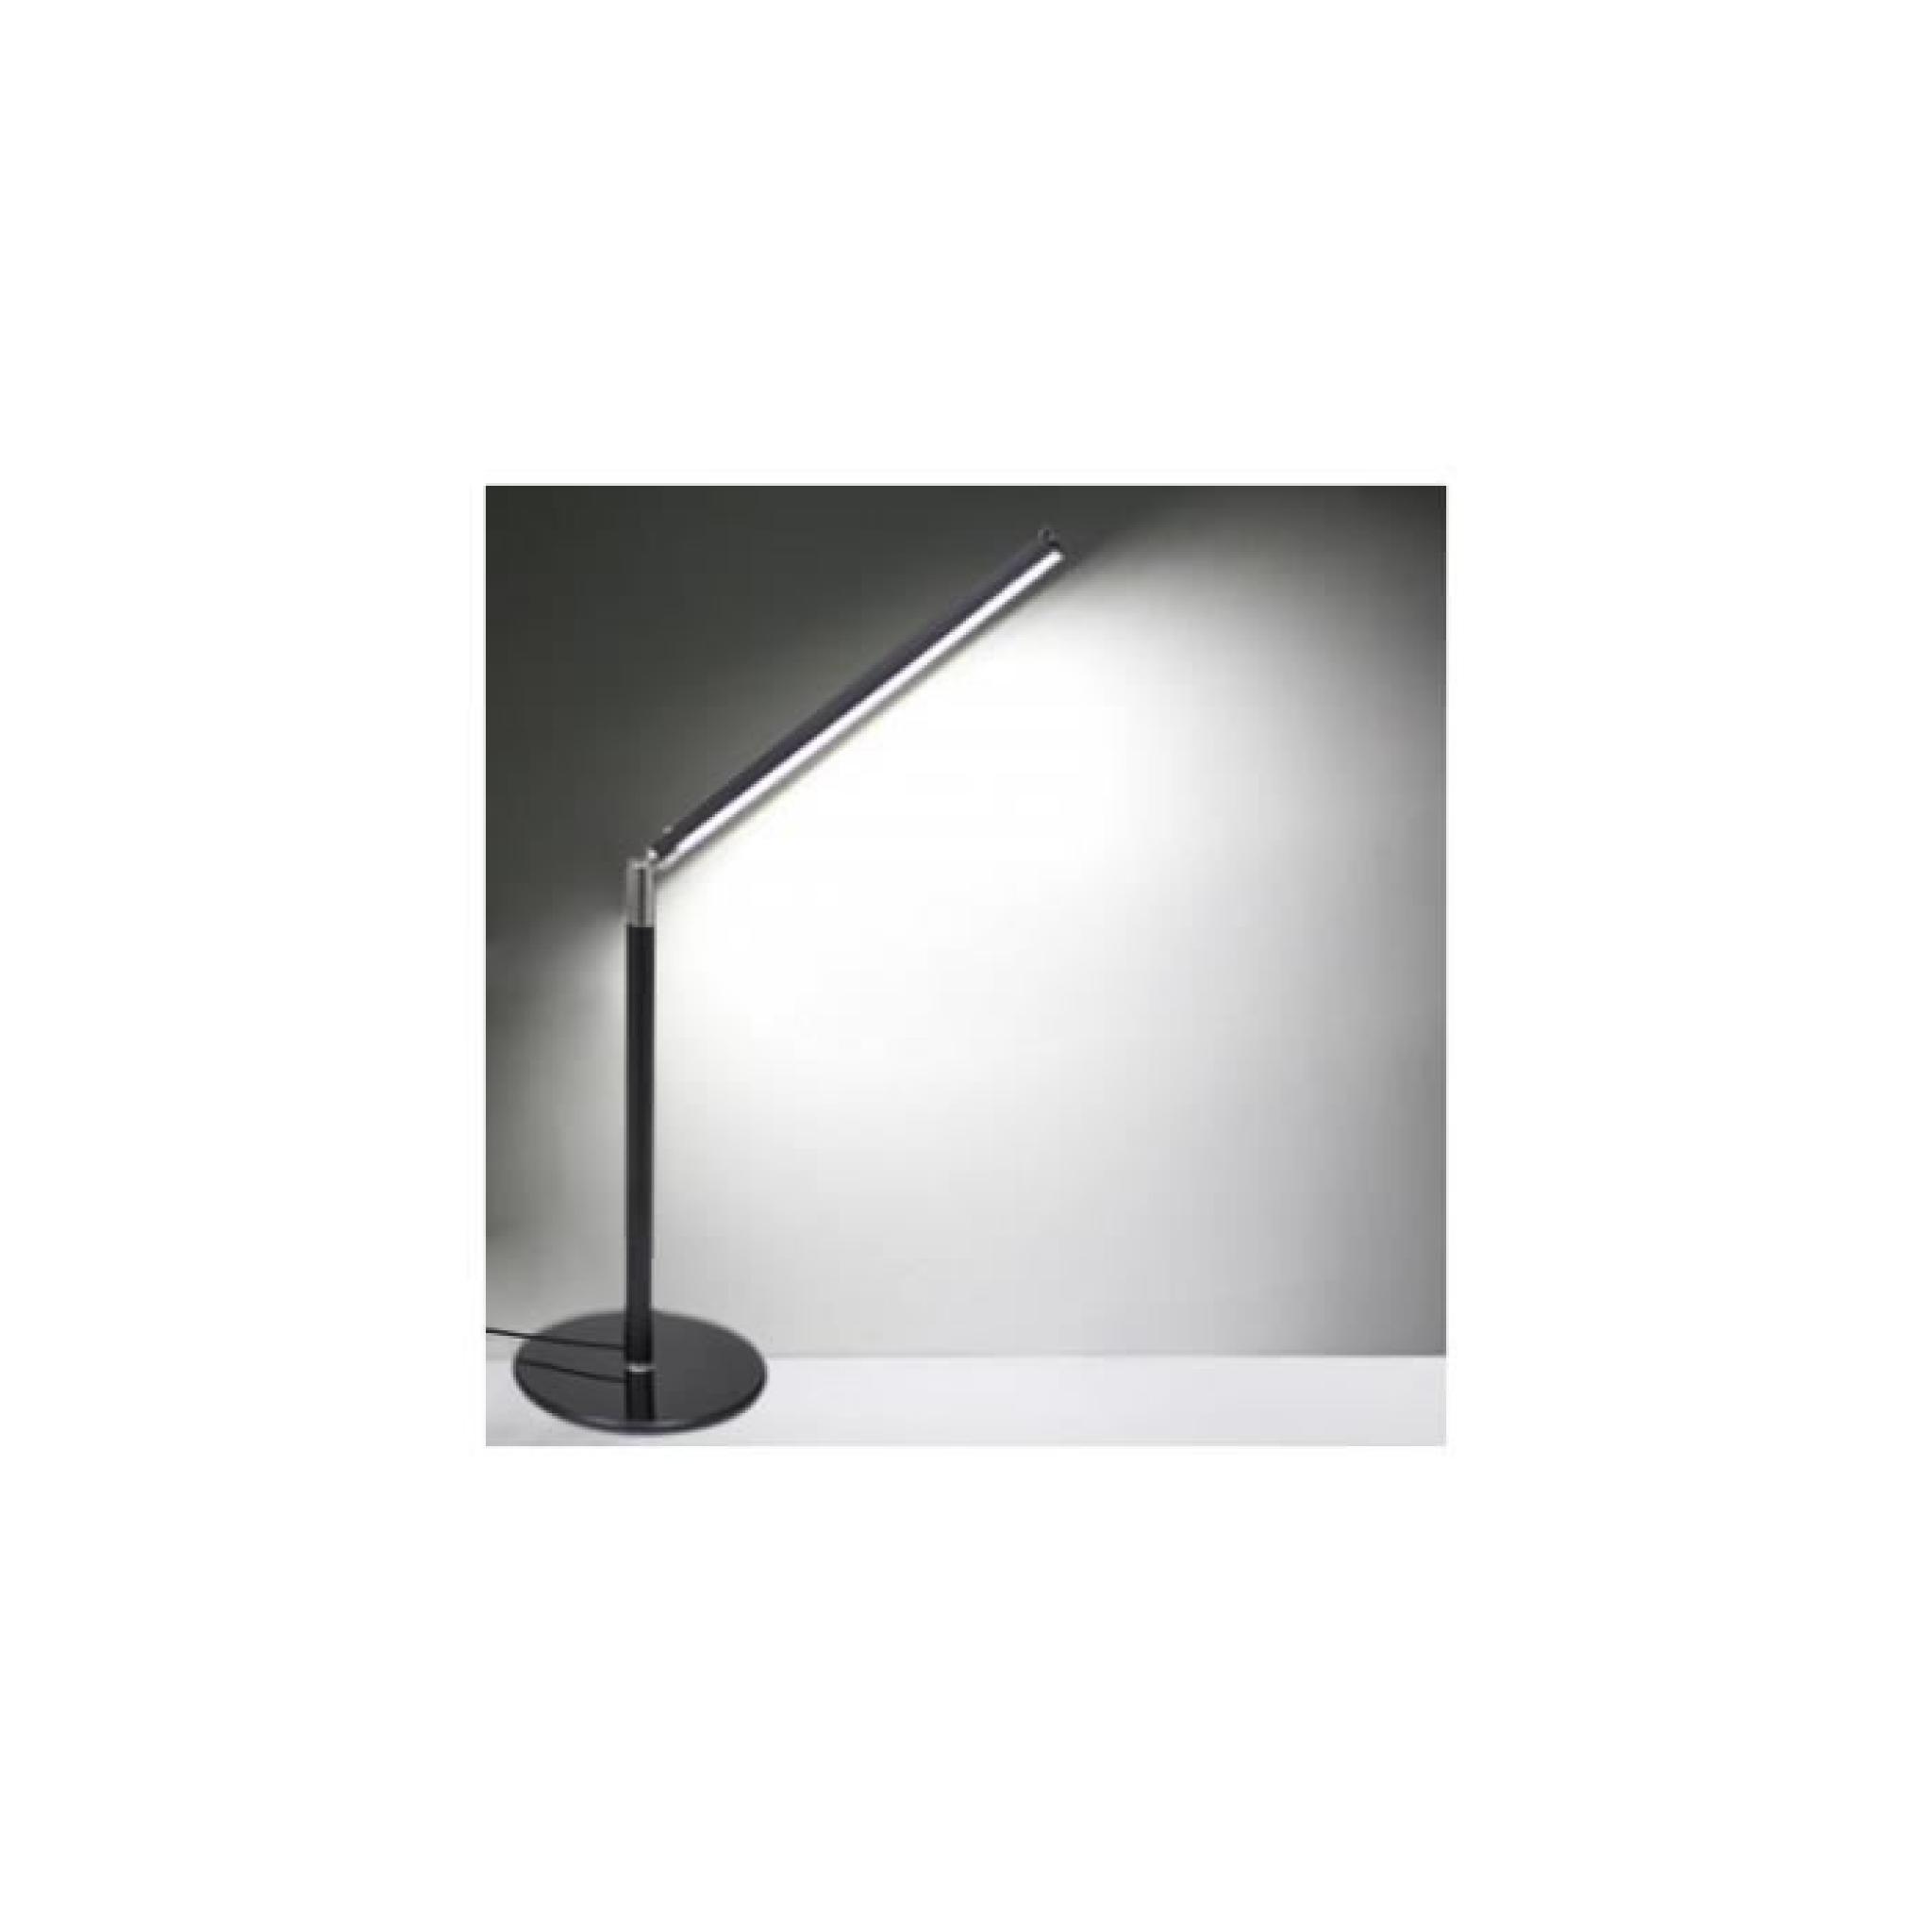 Lampe A Poser Design Pas Cher Lampe Design Atylia Lampe Poser